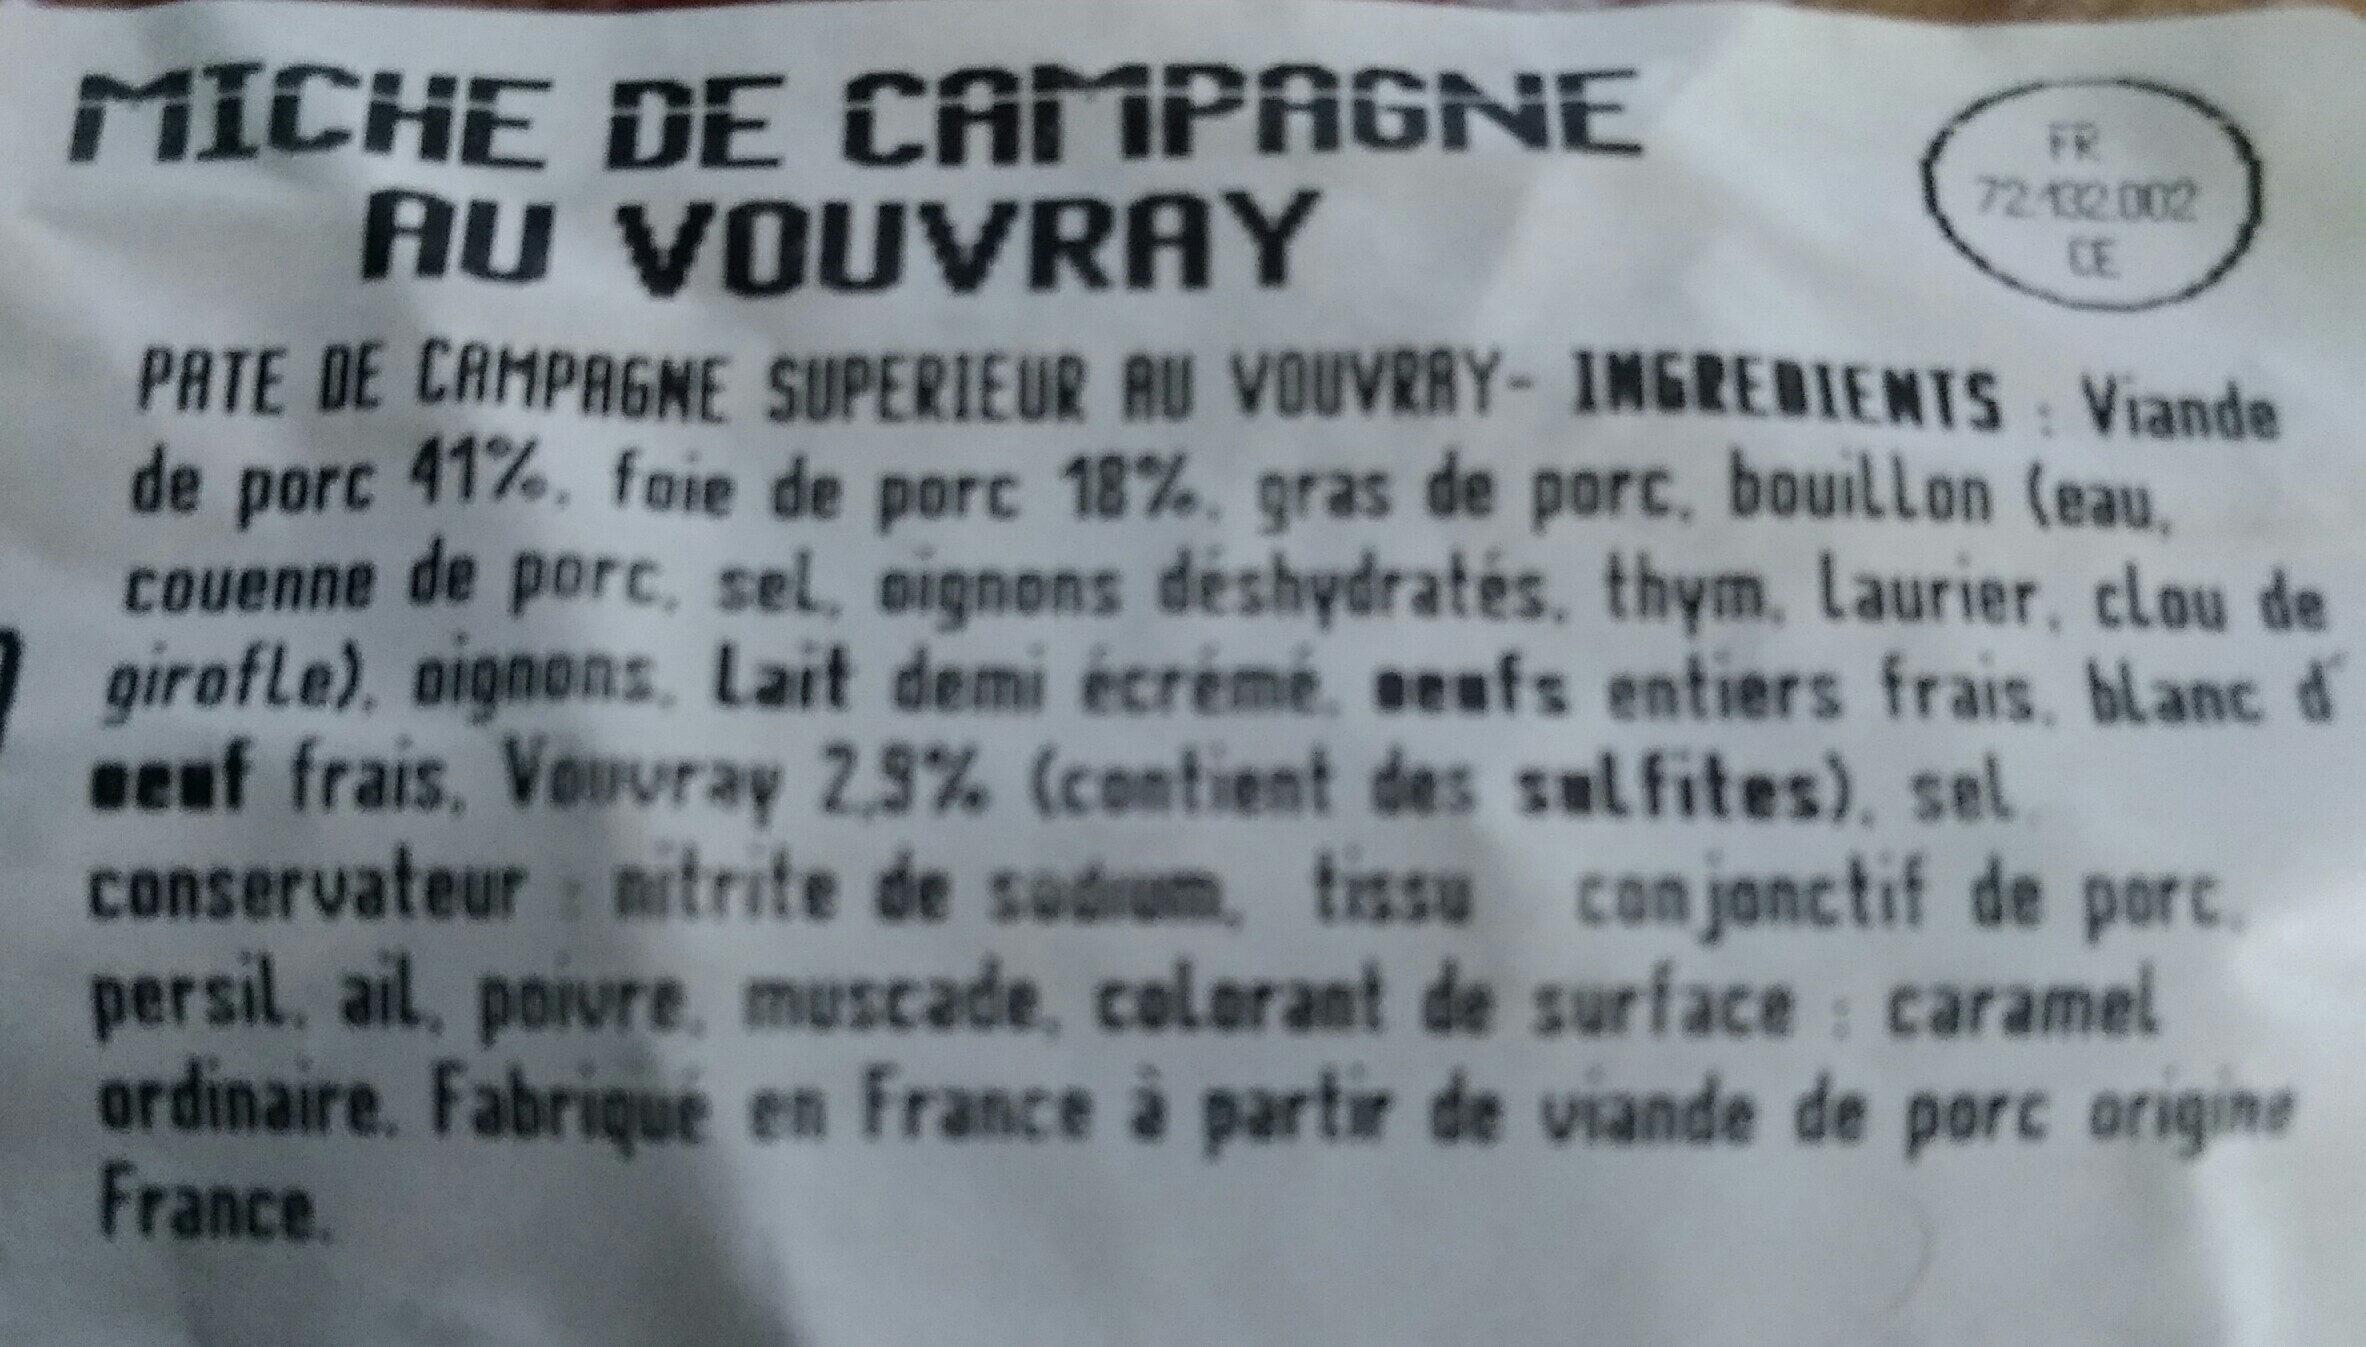 Miche de campagne au vouvray - Ingrediënten - fr